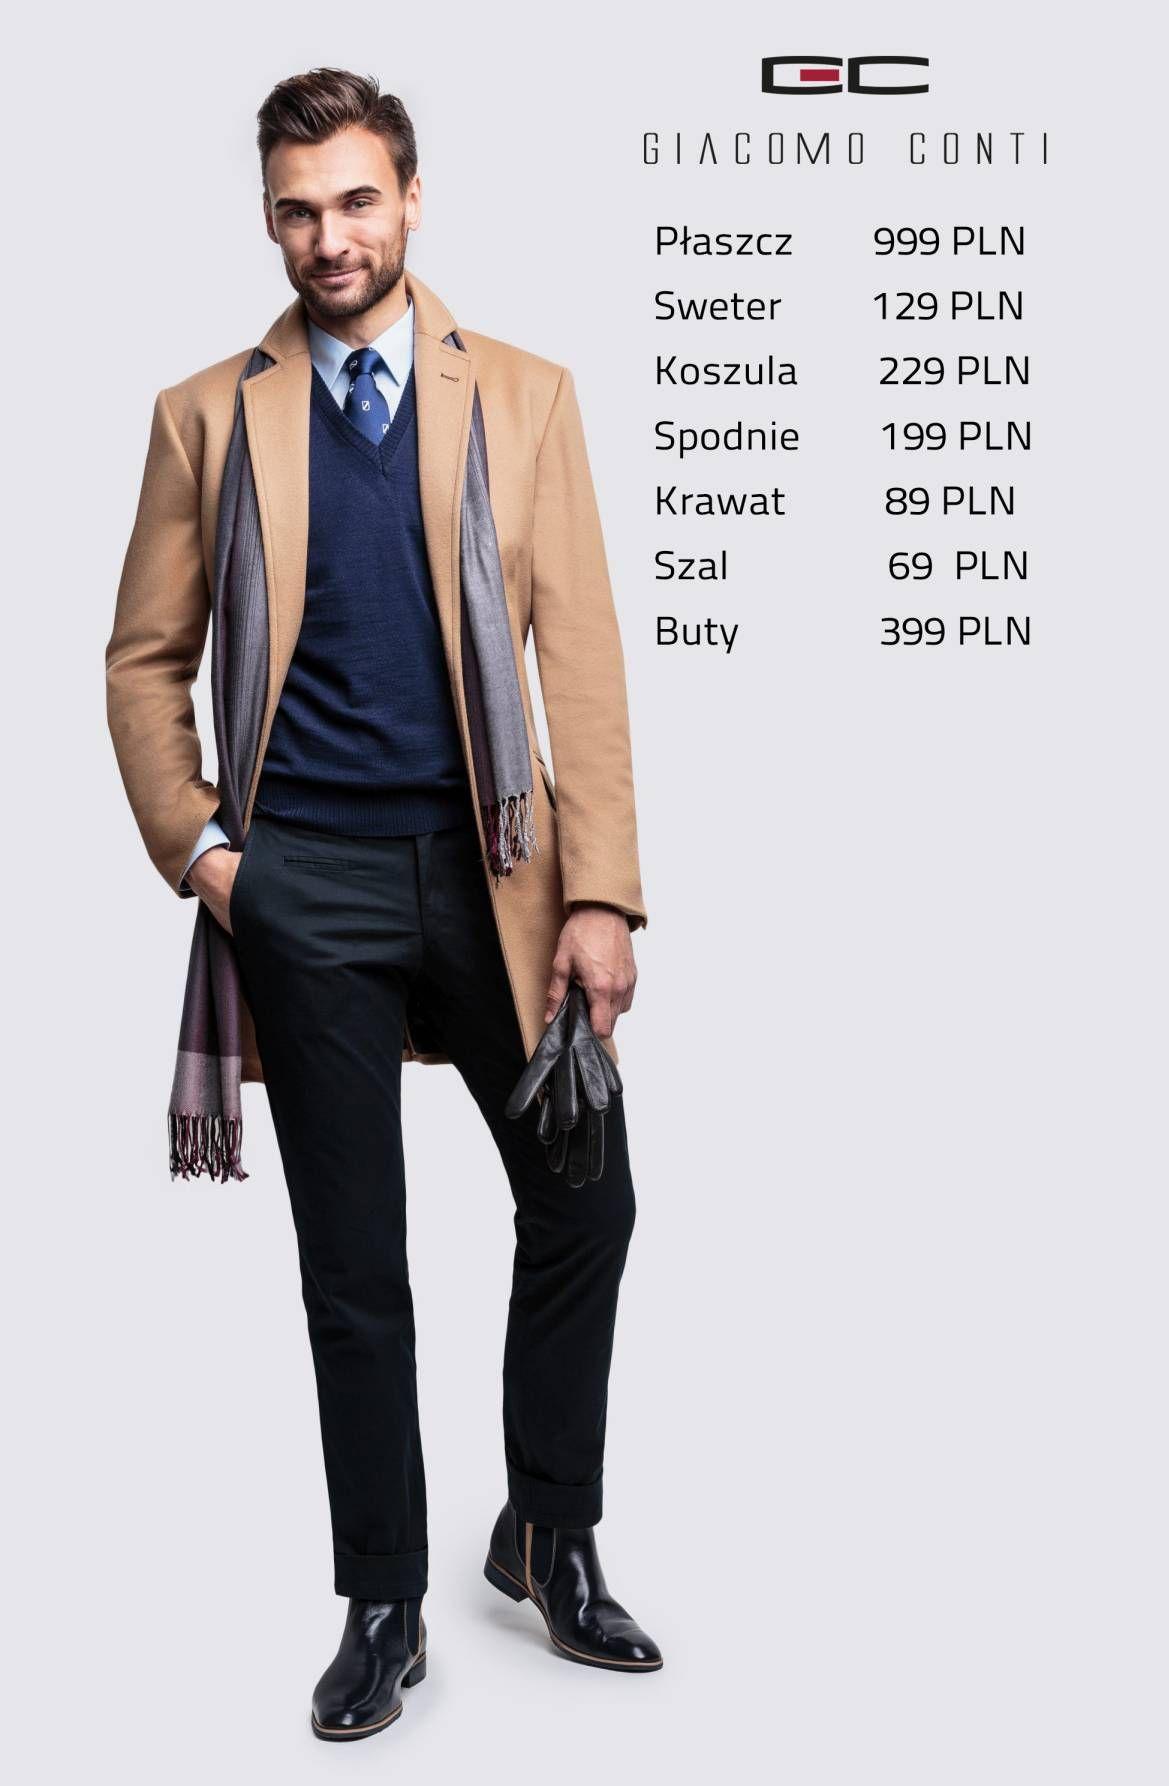 Stylizacja Giacomo Conti Plaszcz Casimiro 14 72 Wk Sweter Severo 13 114 Sr Koszula Michele 14 08 24 Spodnie Ri Mens Fashion Suits Suit Fashion Men S Blazer